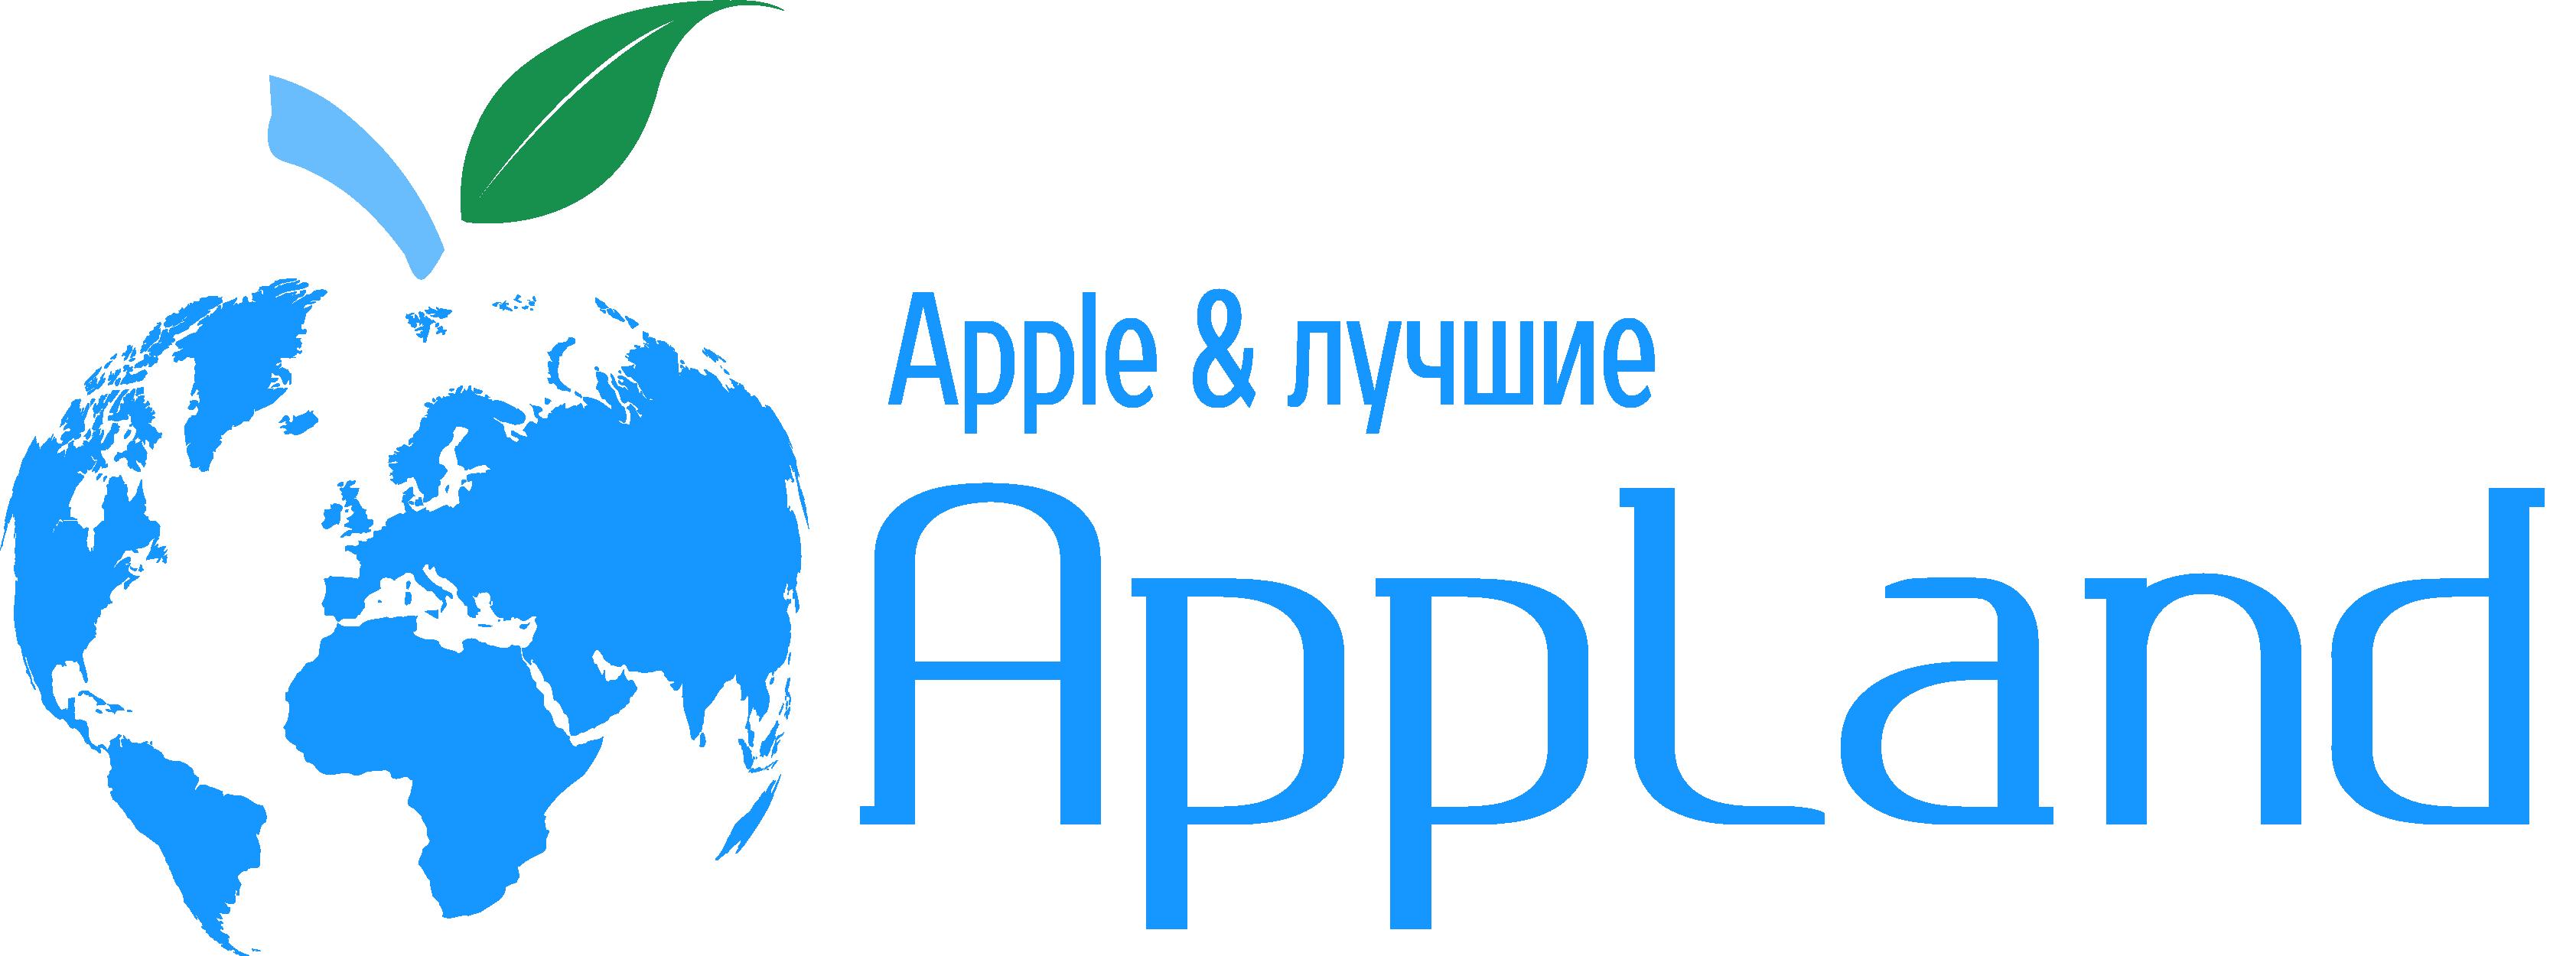 IMobile: Продажа iPhone 5s, iPhone 6, iPad Air в Нижнем